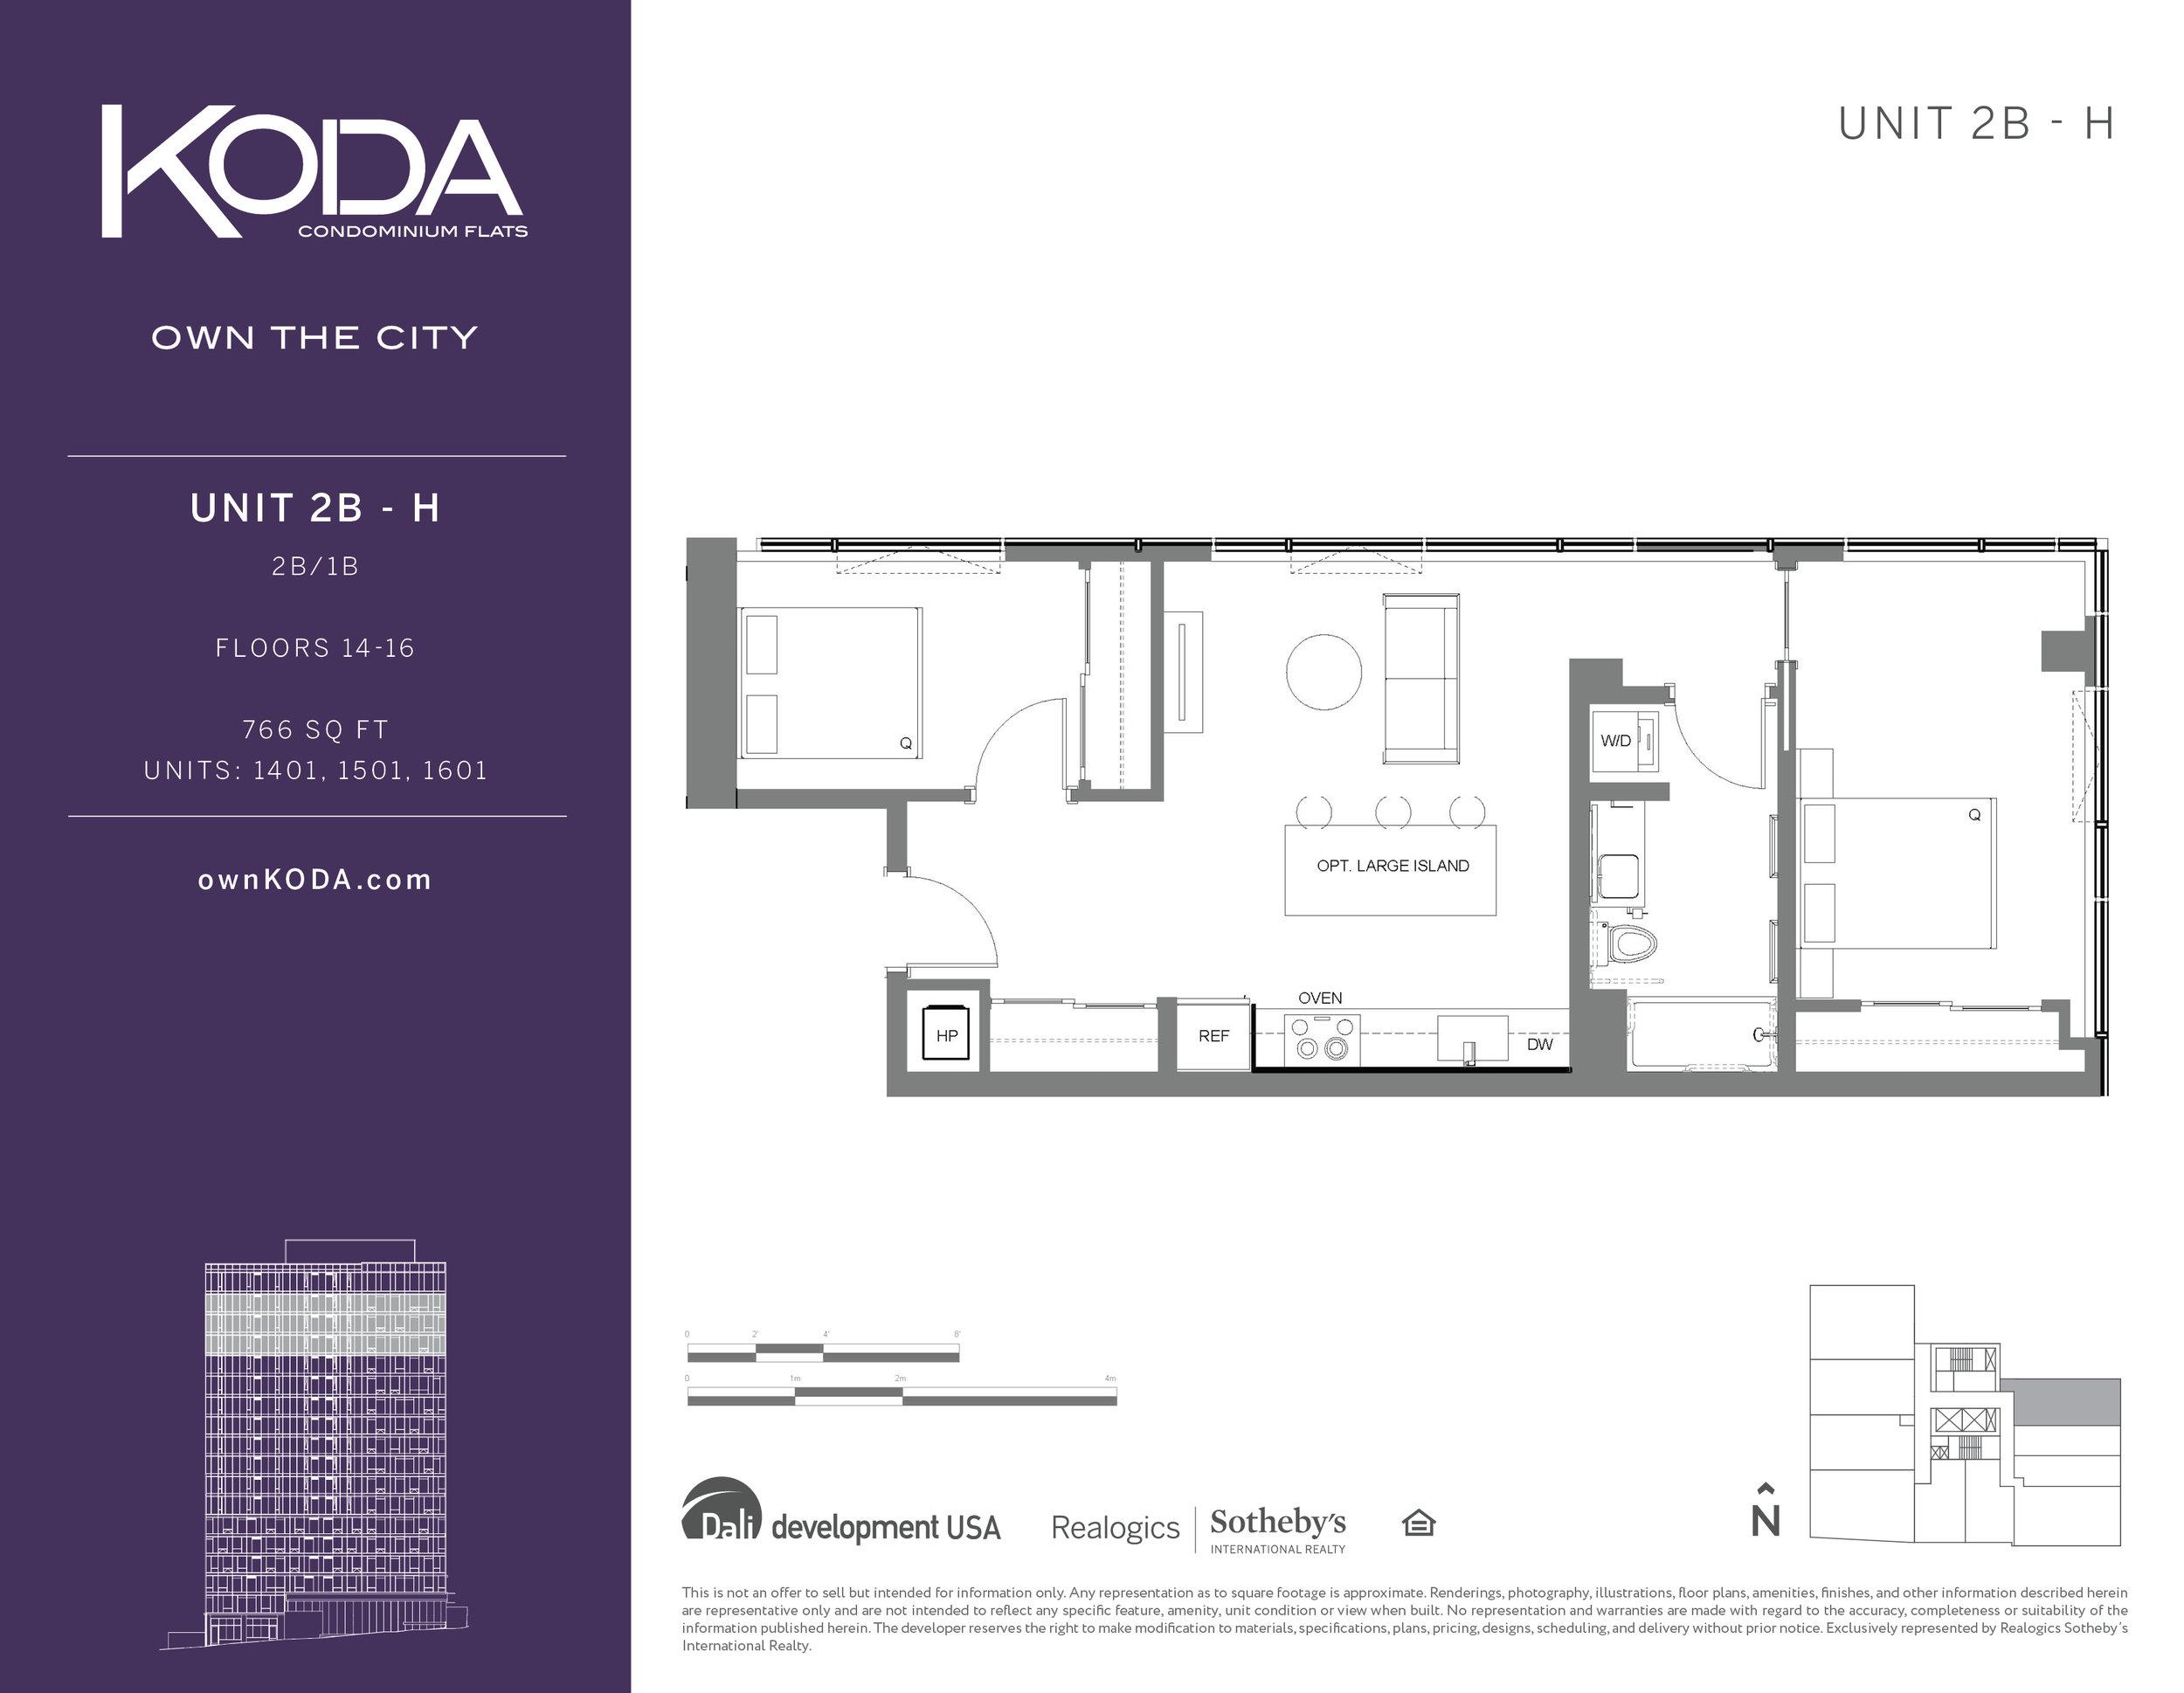 KODA_FloorPlanFlyer_Update_Approved_04.04.19_Release34.jpg